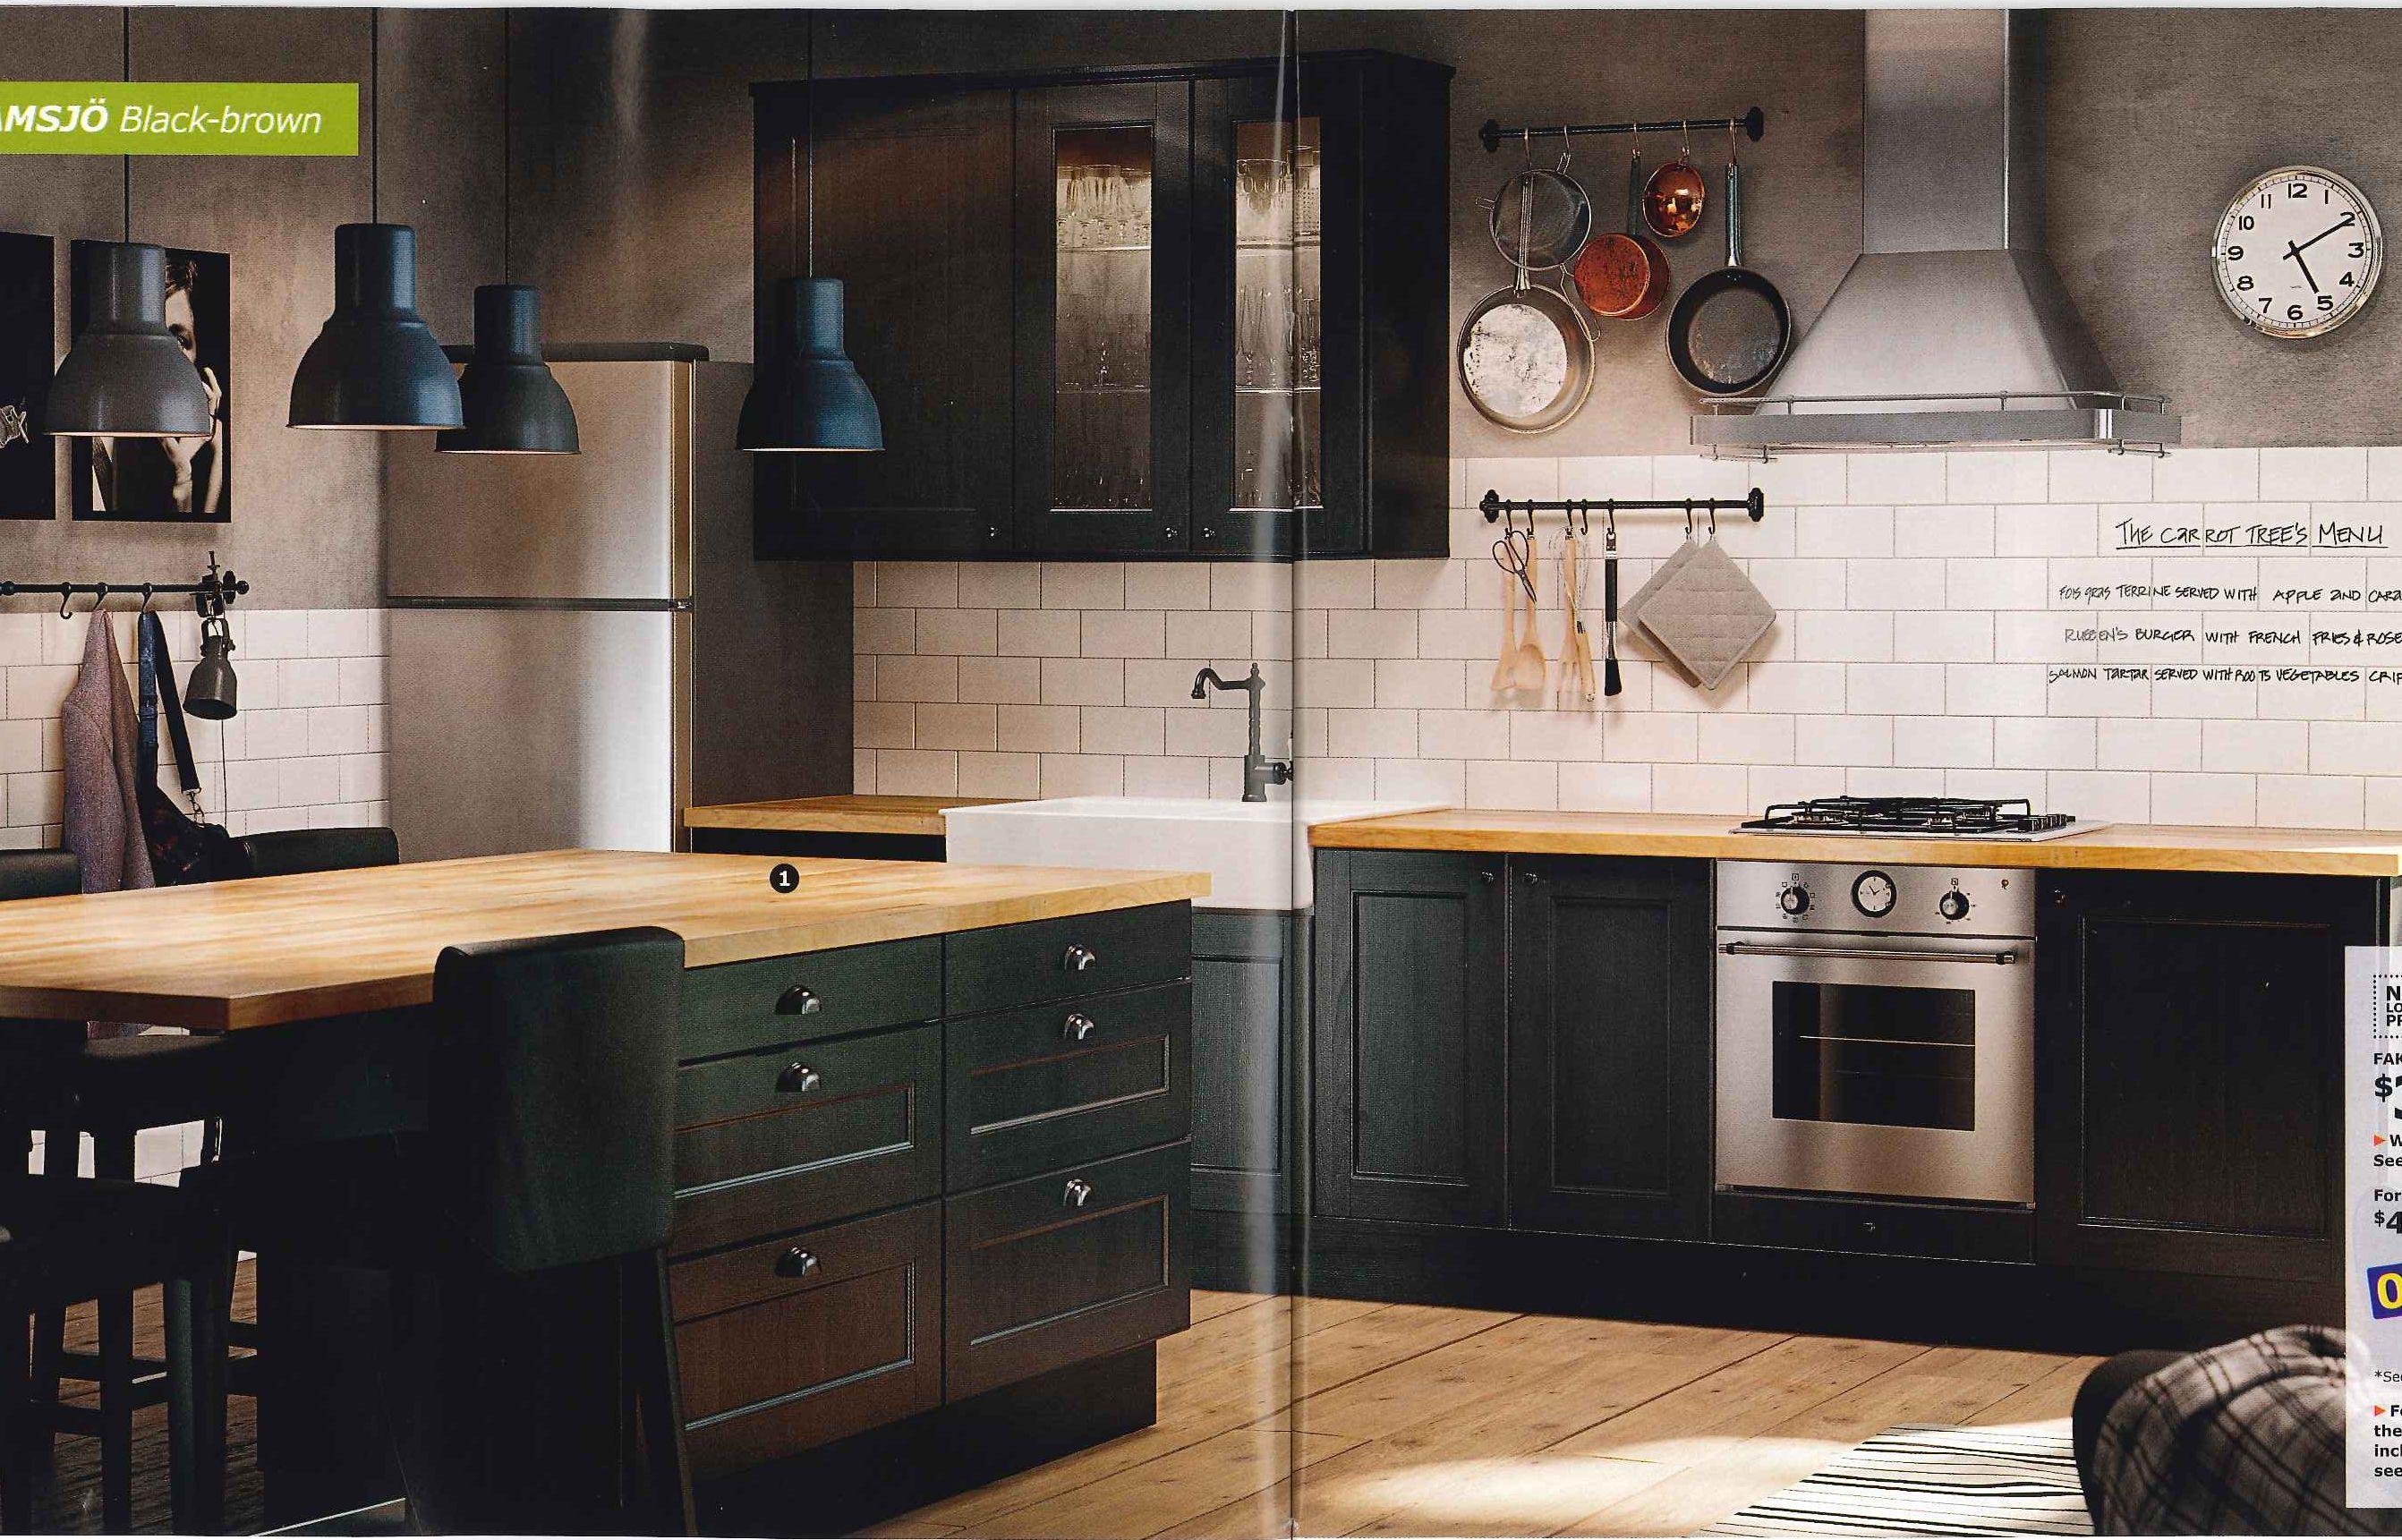 black ikea kitchenjpg 26841721 pixels cocina negra pinterest ikea kitchen search and black kitchens - Ikea Black Kitchen Cabinets